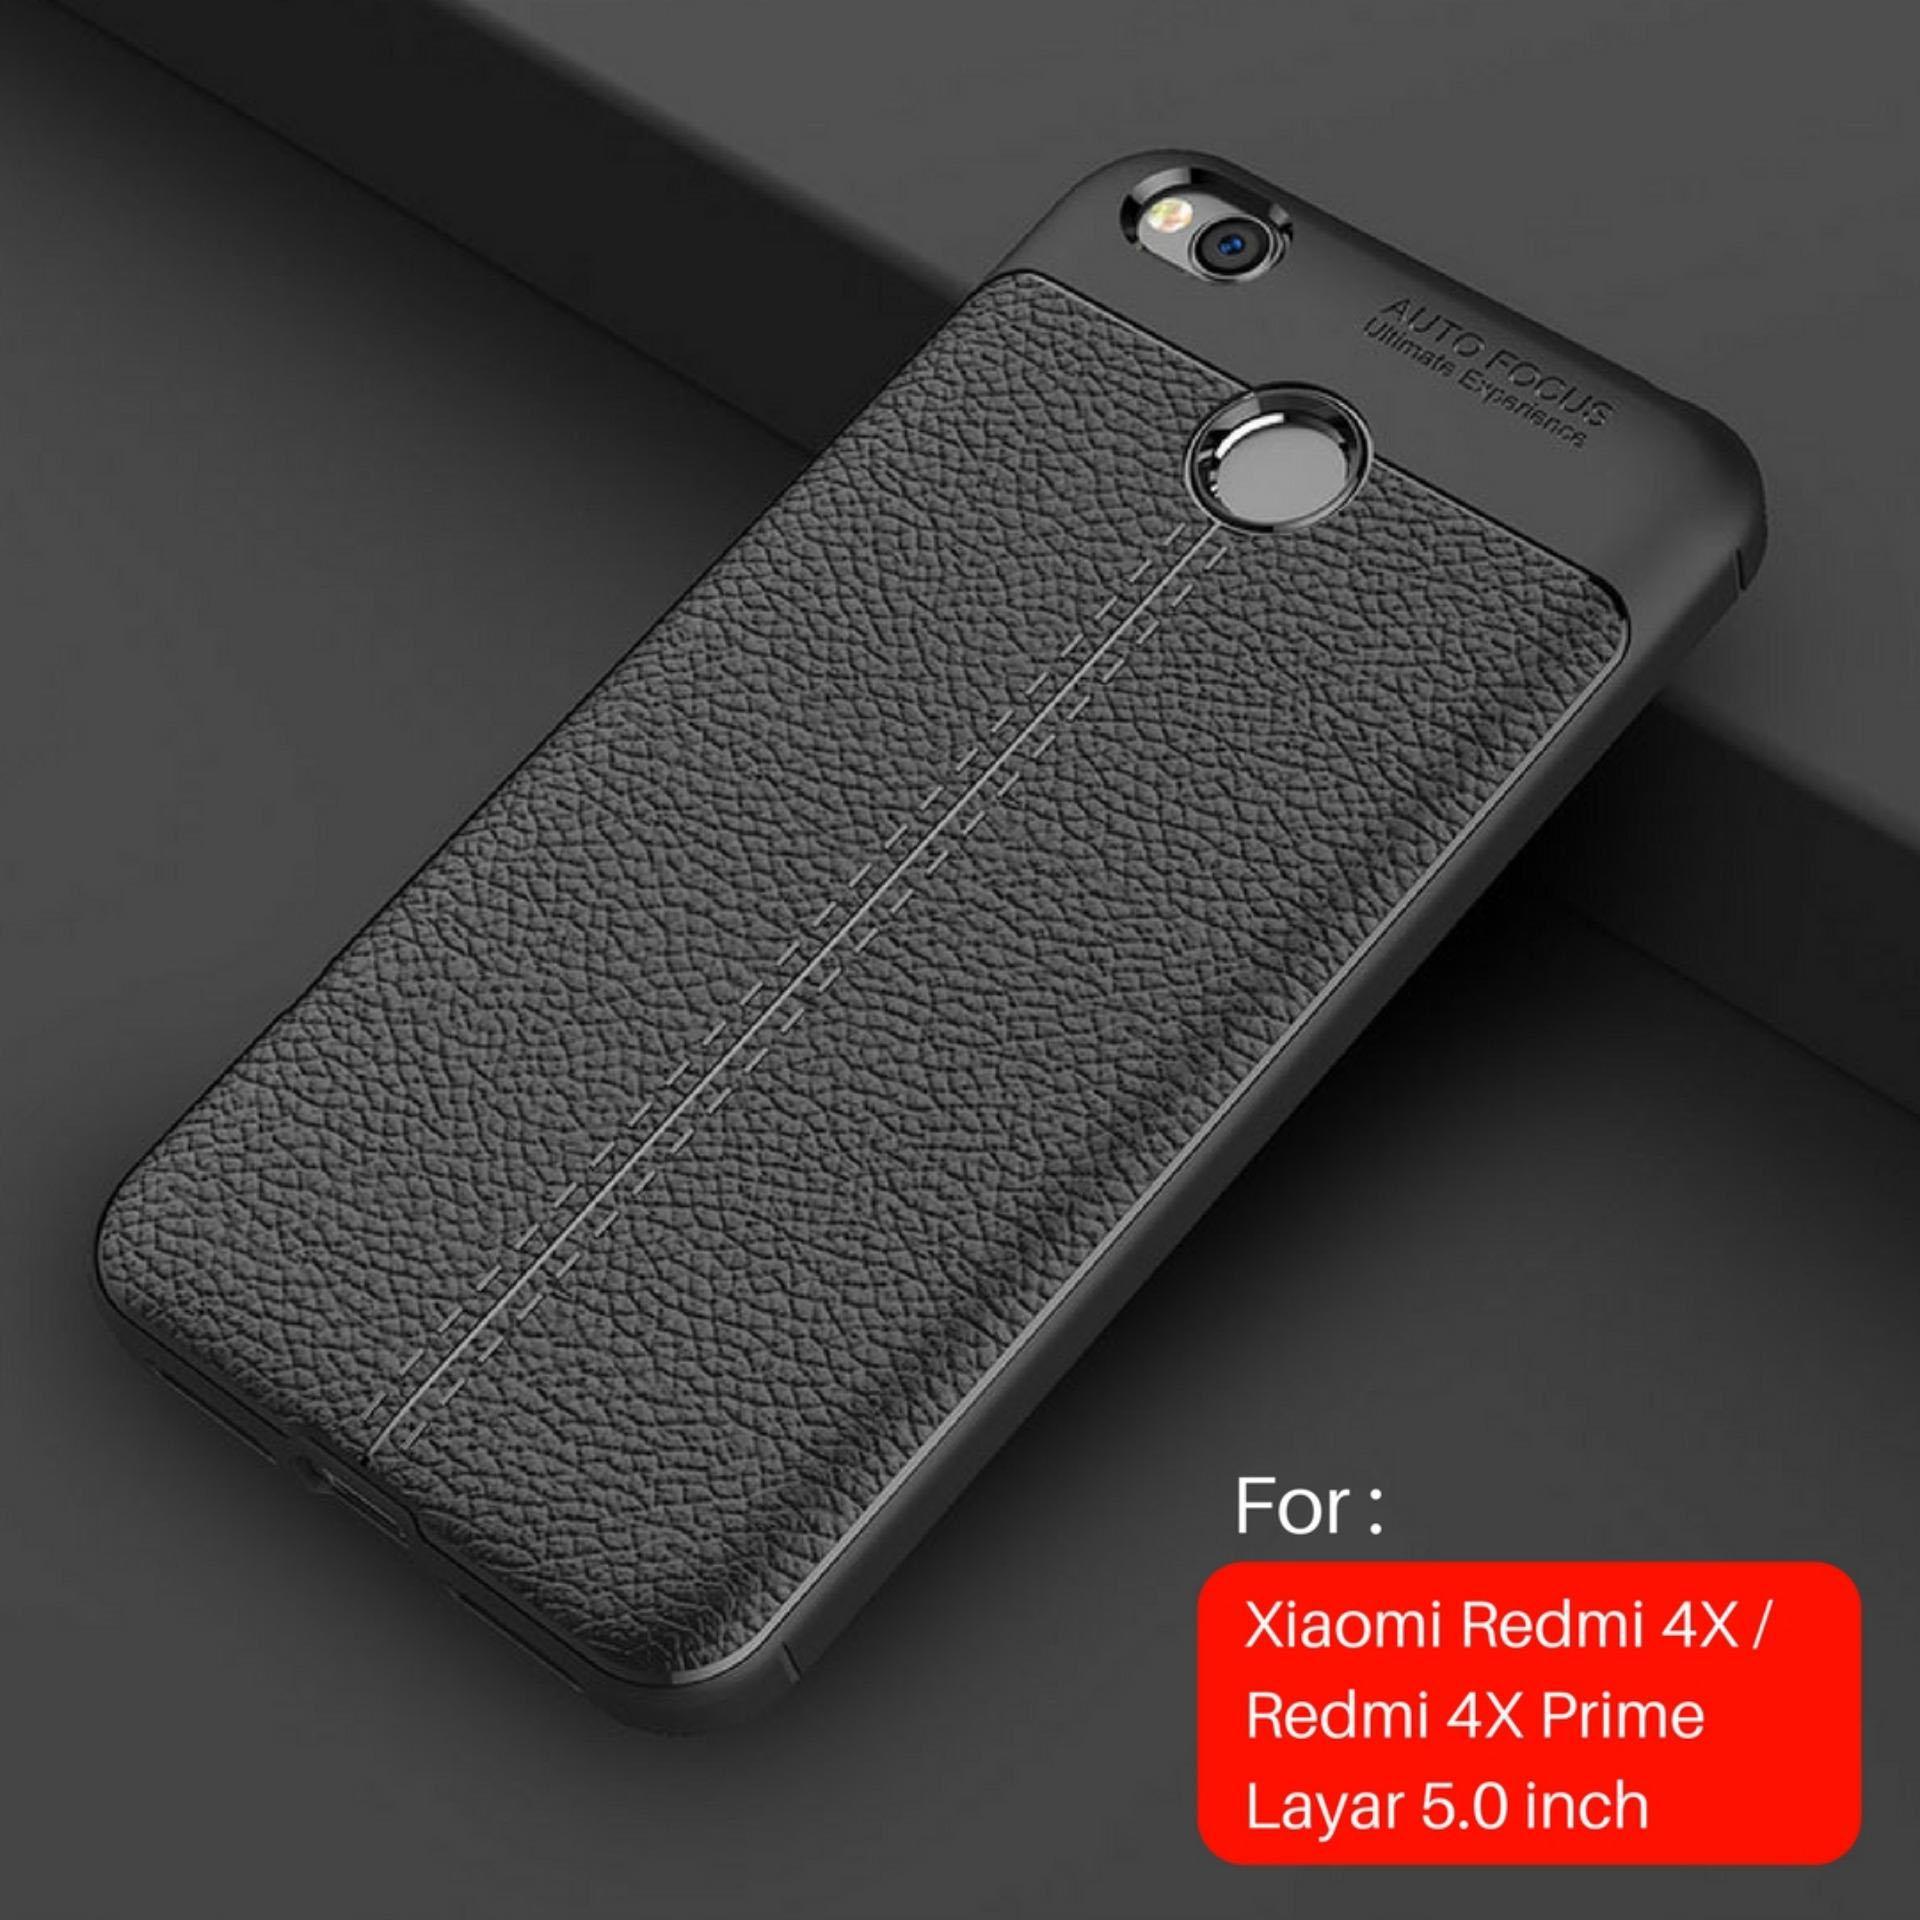 Gambar Produk Rinci Jak Shop Leather Softcase For Xiaomi Redmi 4X / 4X Prime Layar 5